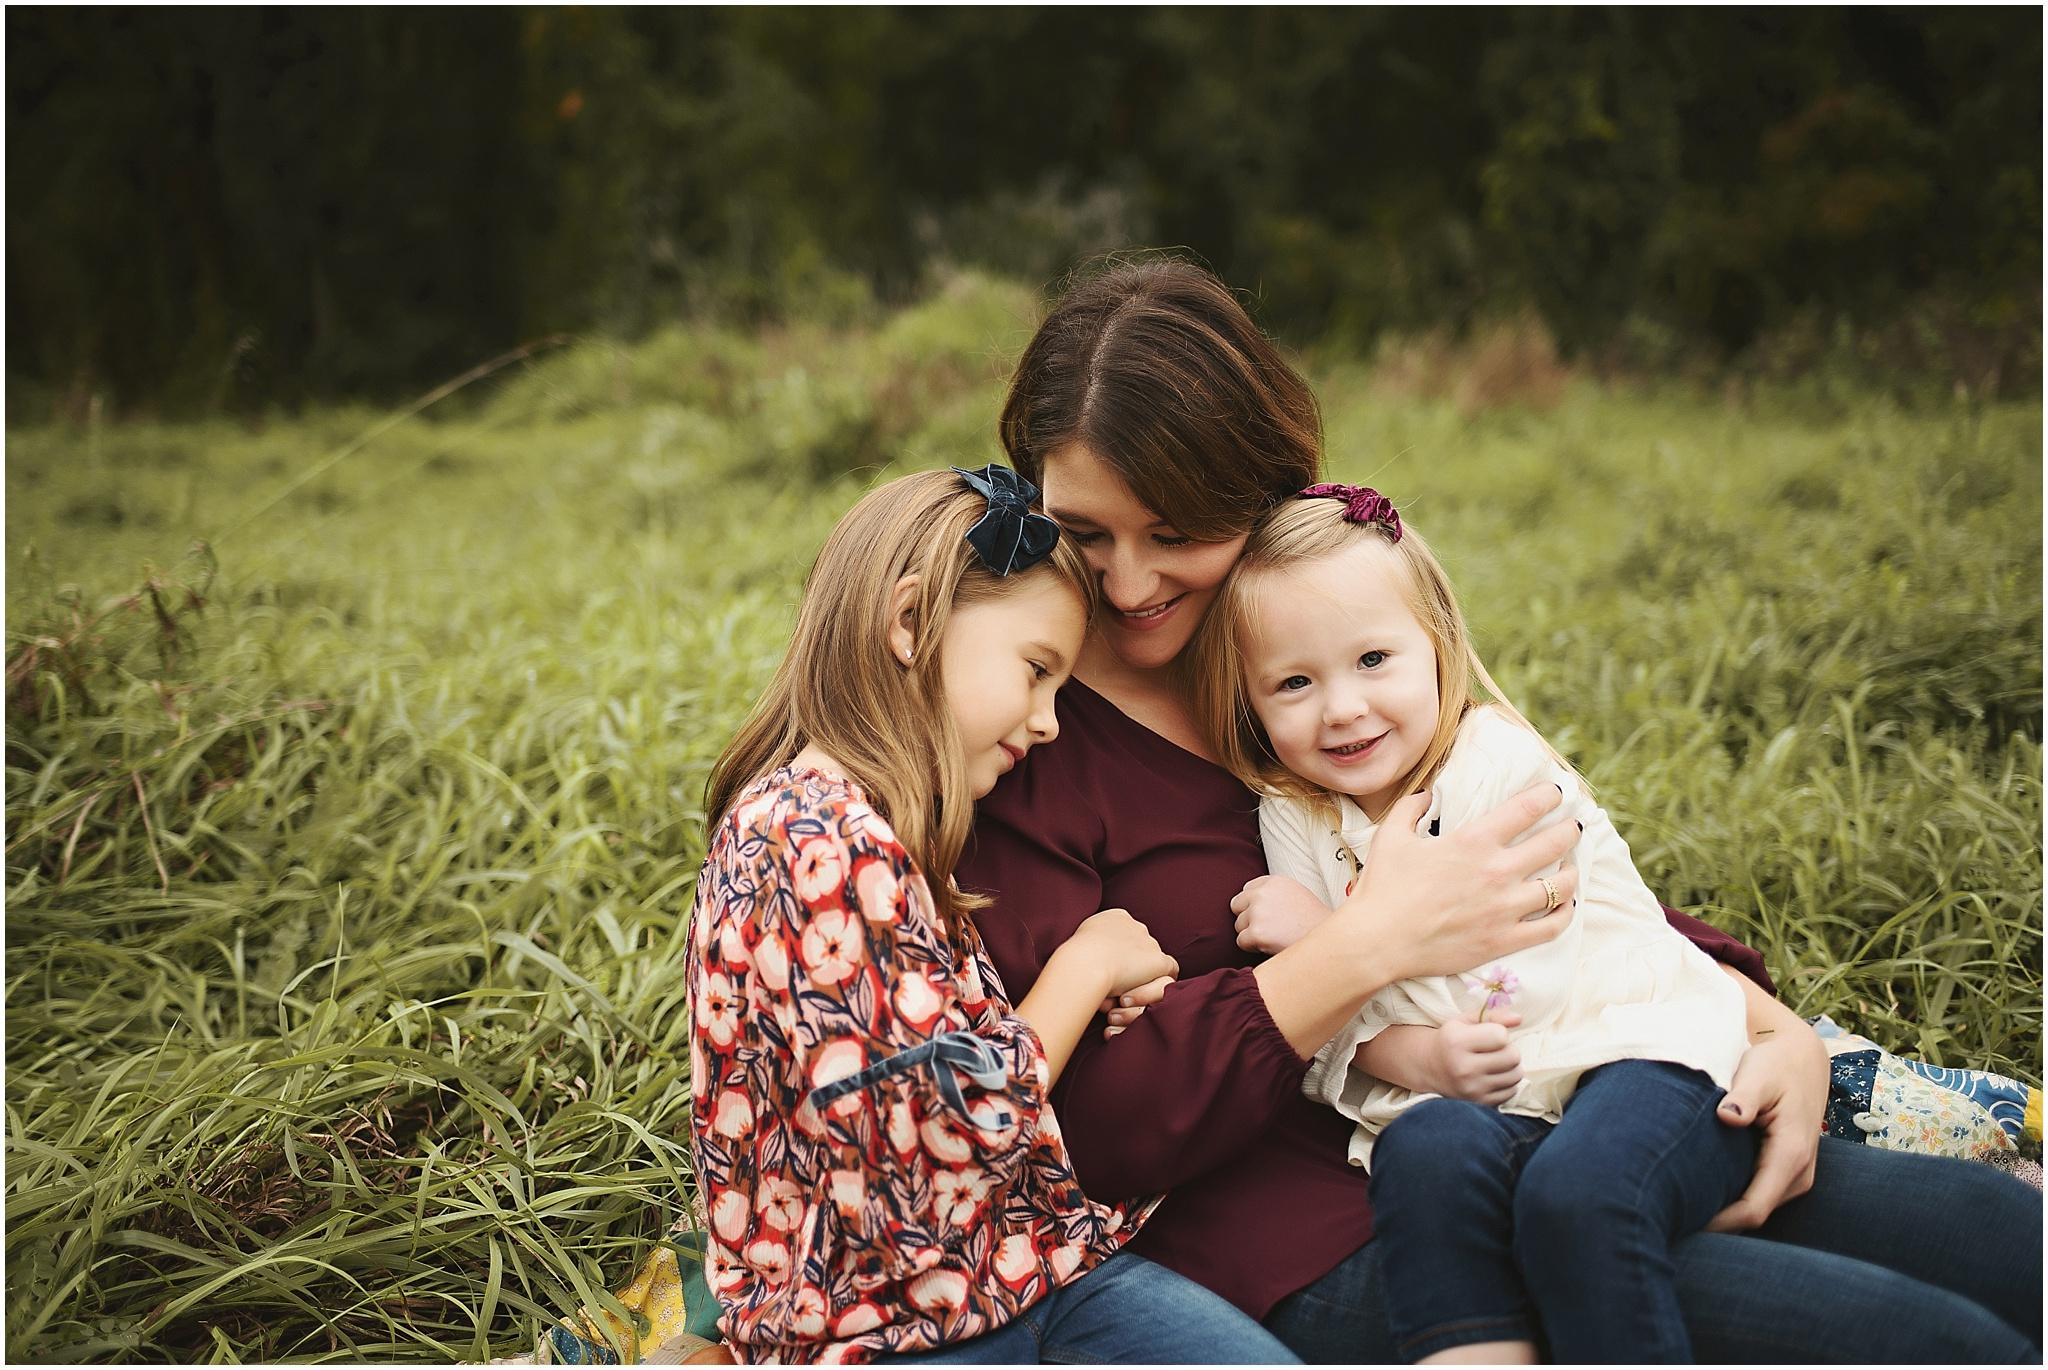 karra lynn photography - family photographer milford mi_0031.jpg